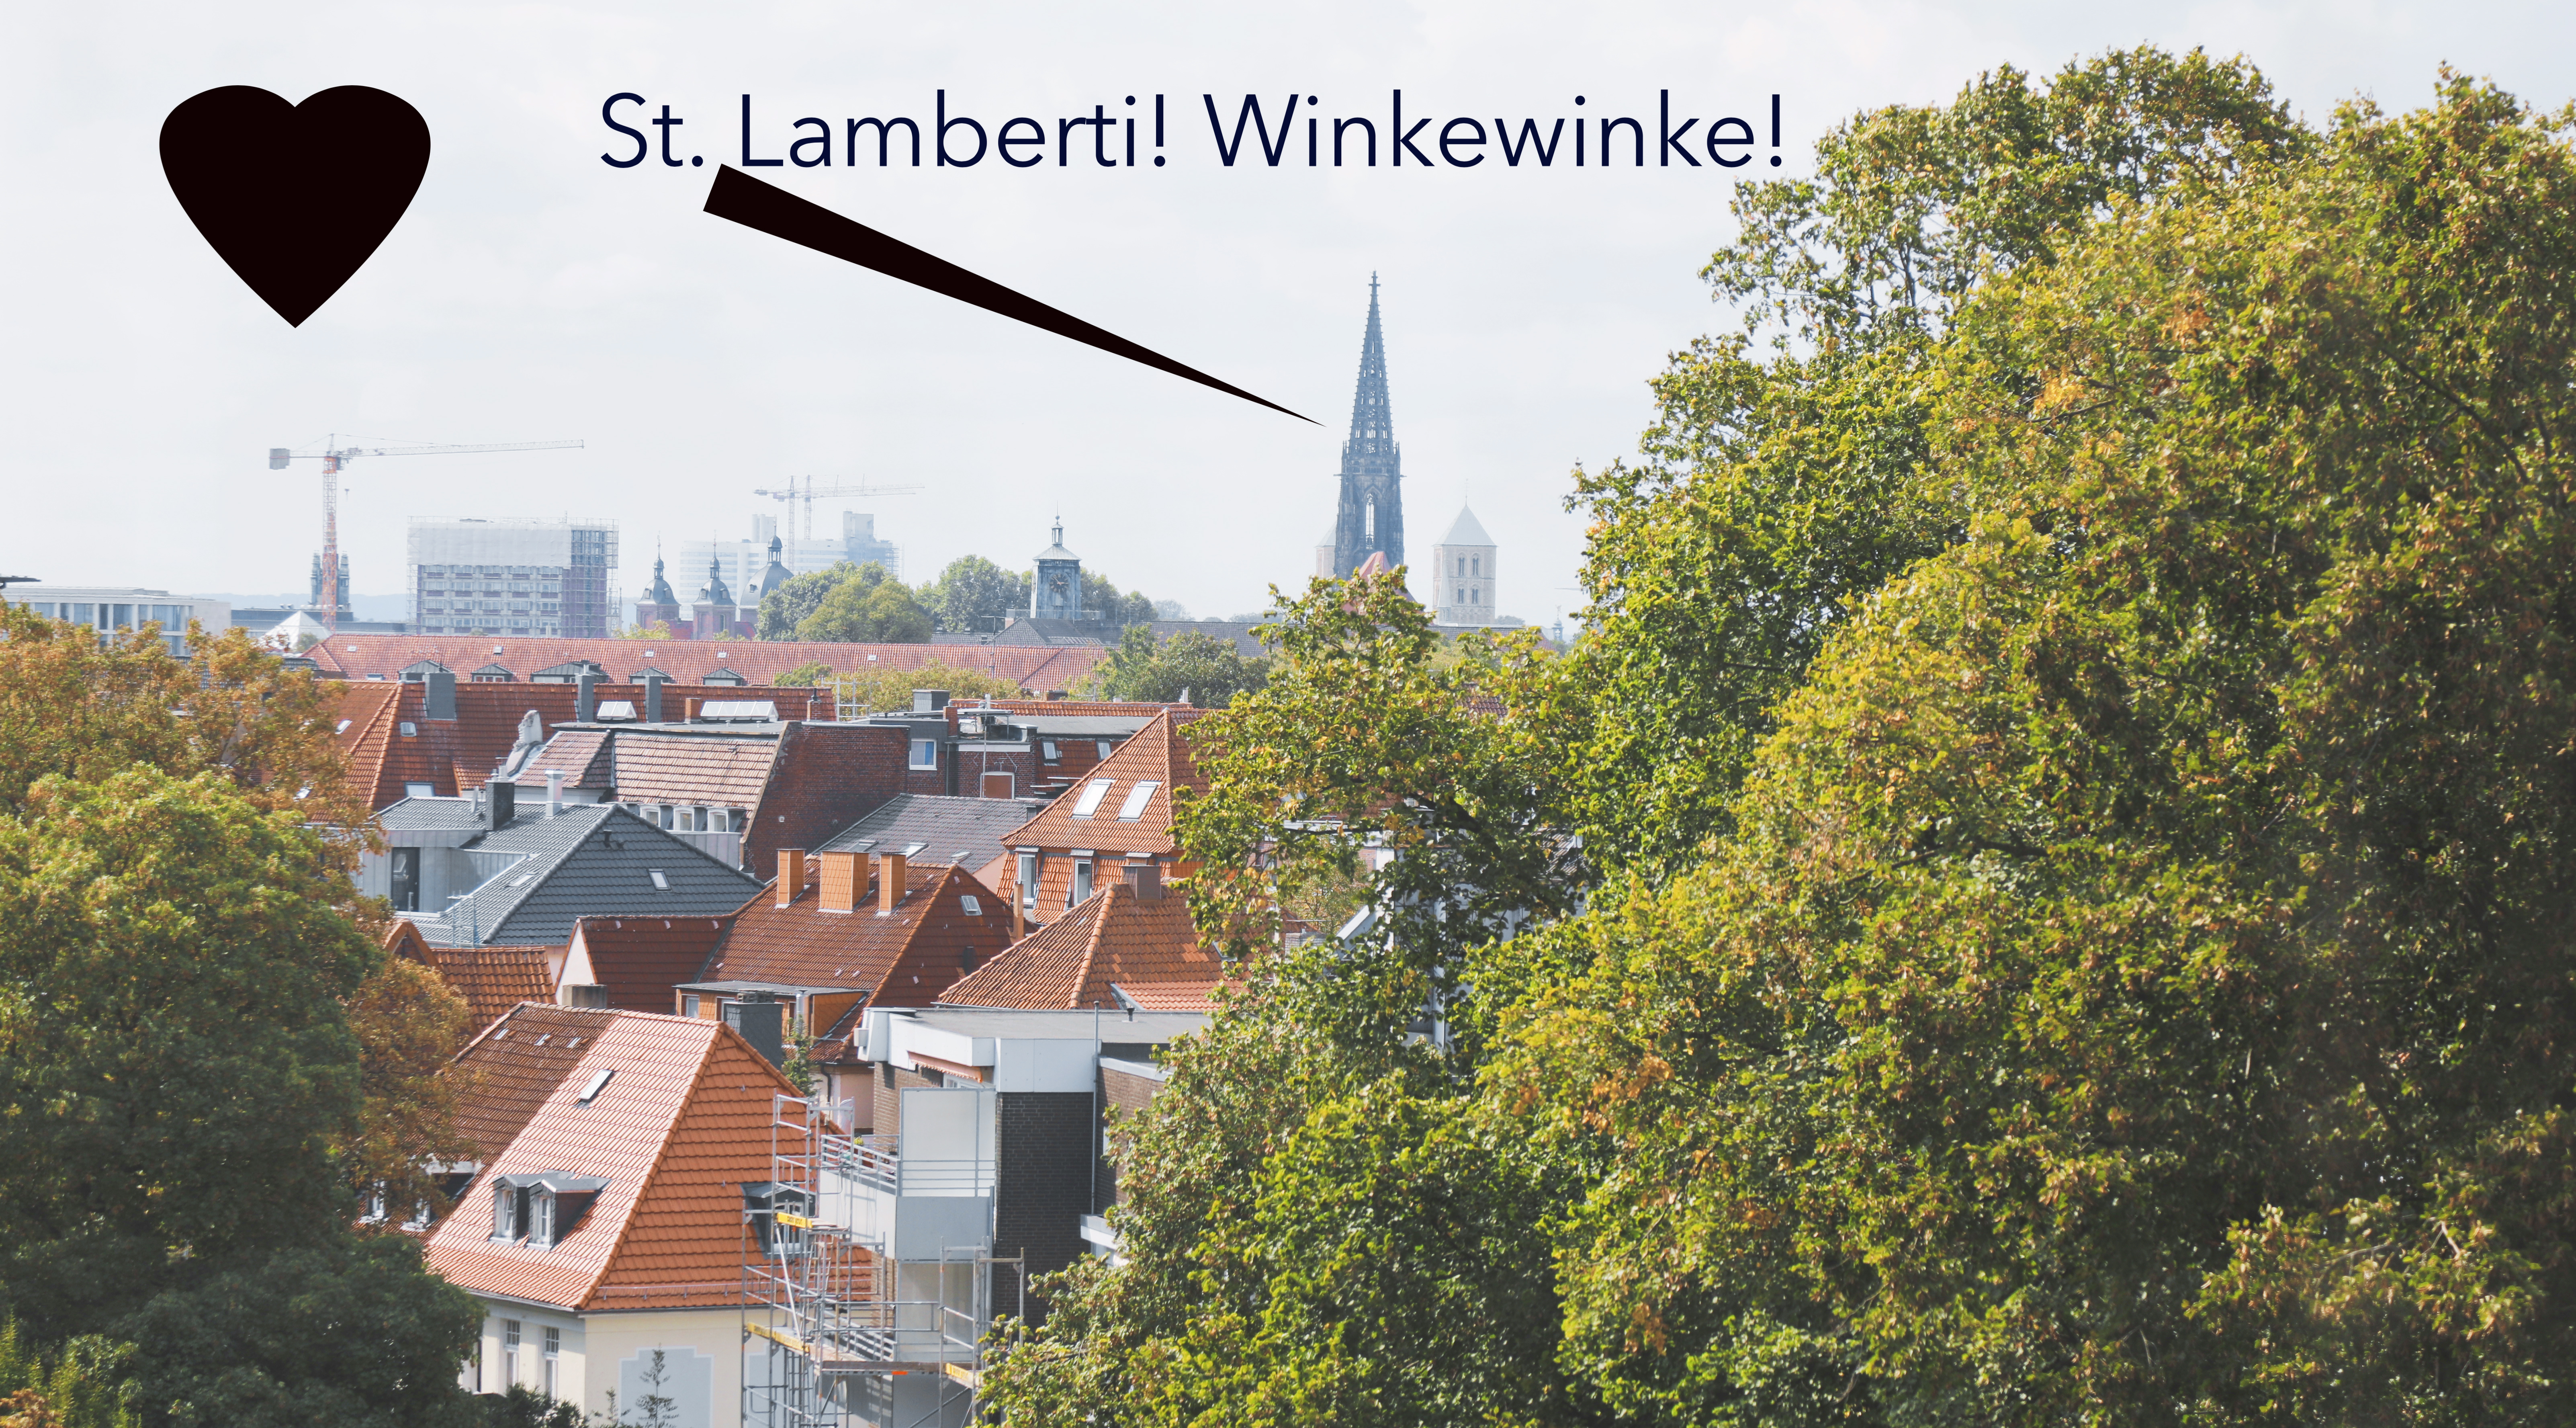 St. Lamberti ist auch sichtbar!